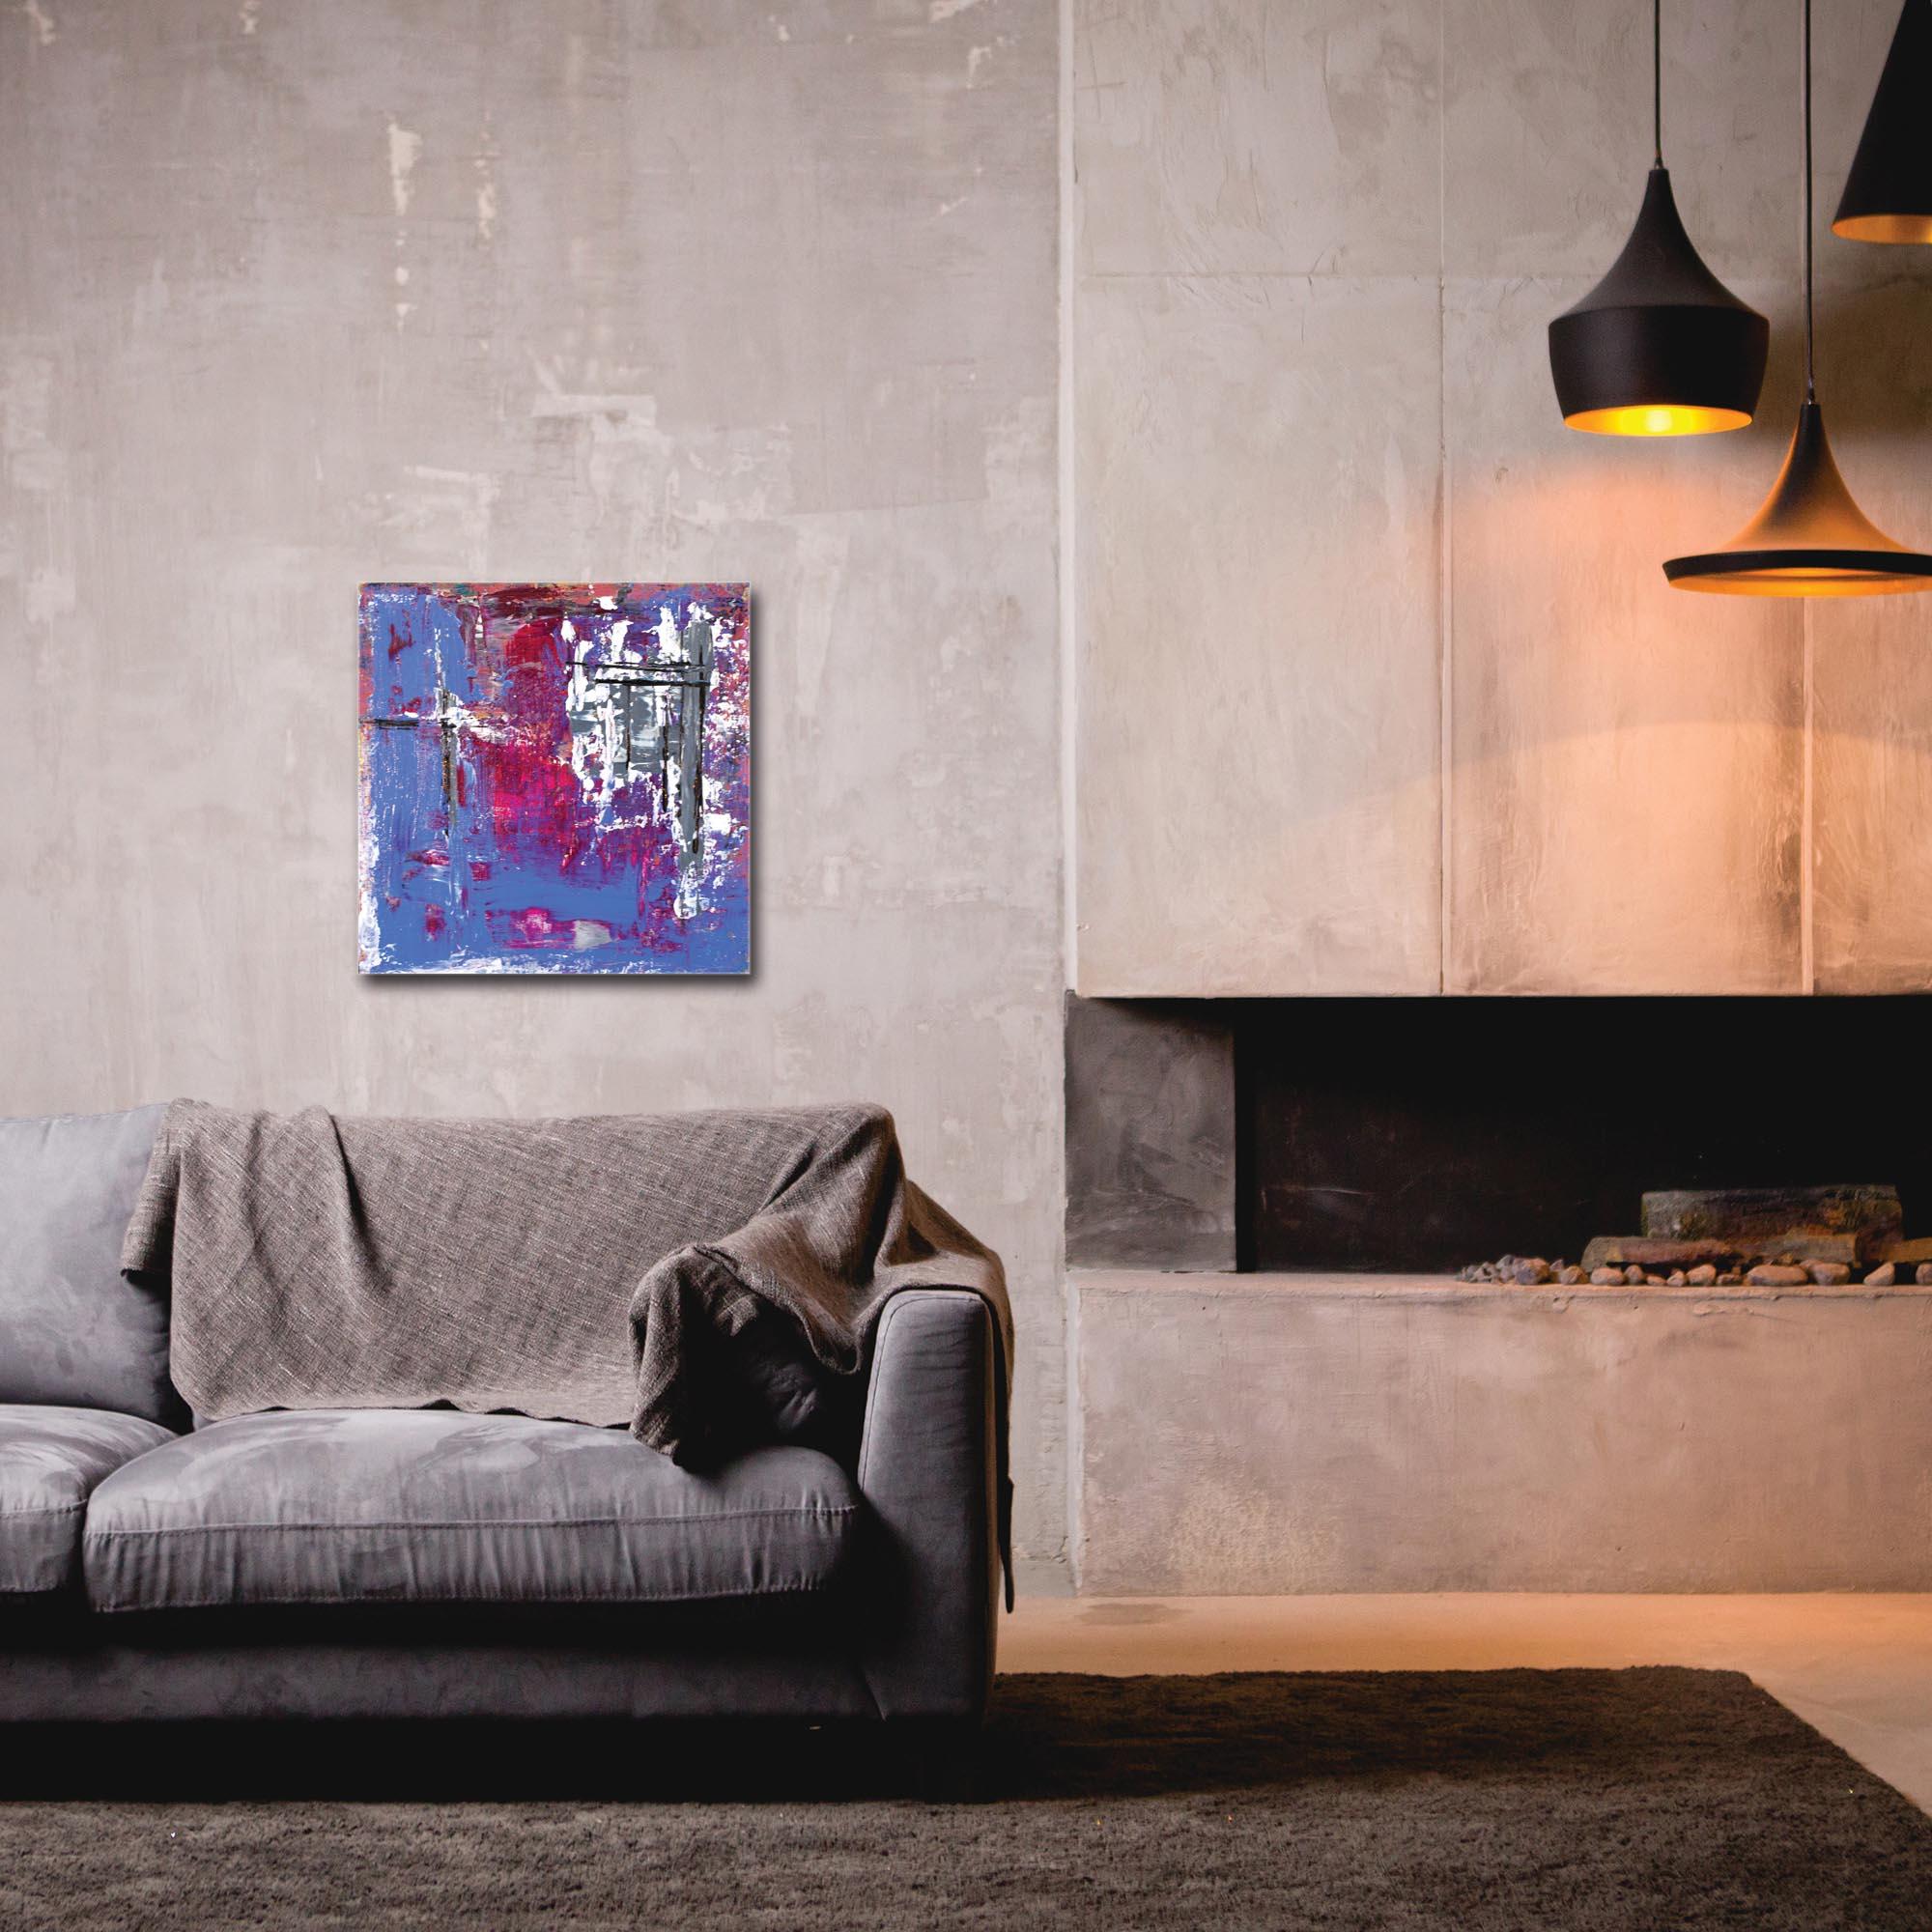 Abstract Wall Art 'Urban Life 7' - Urban Decor on Metal or Plexiglass - Image 3